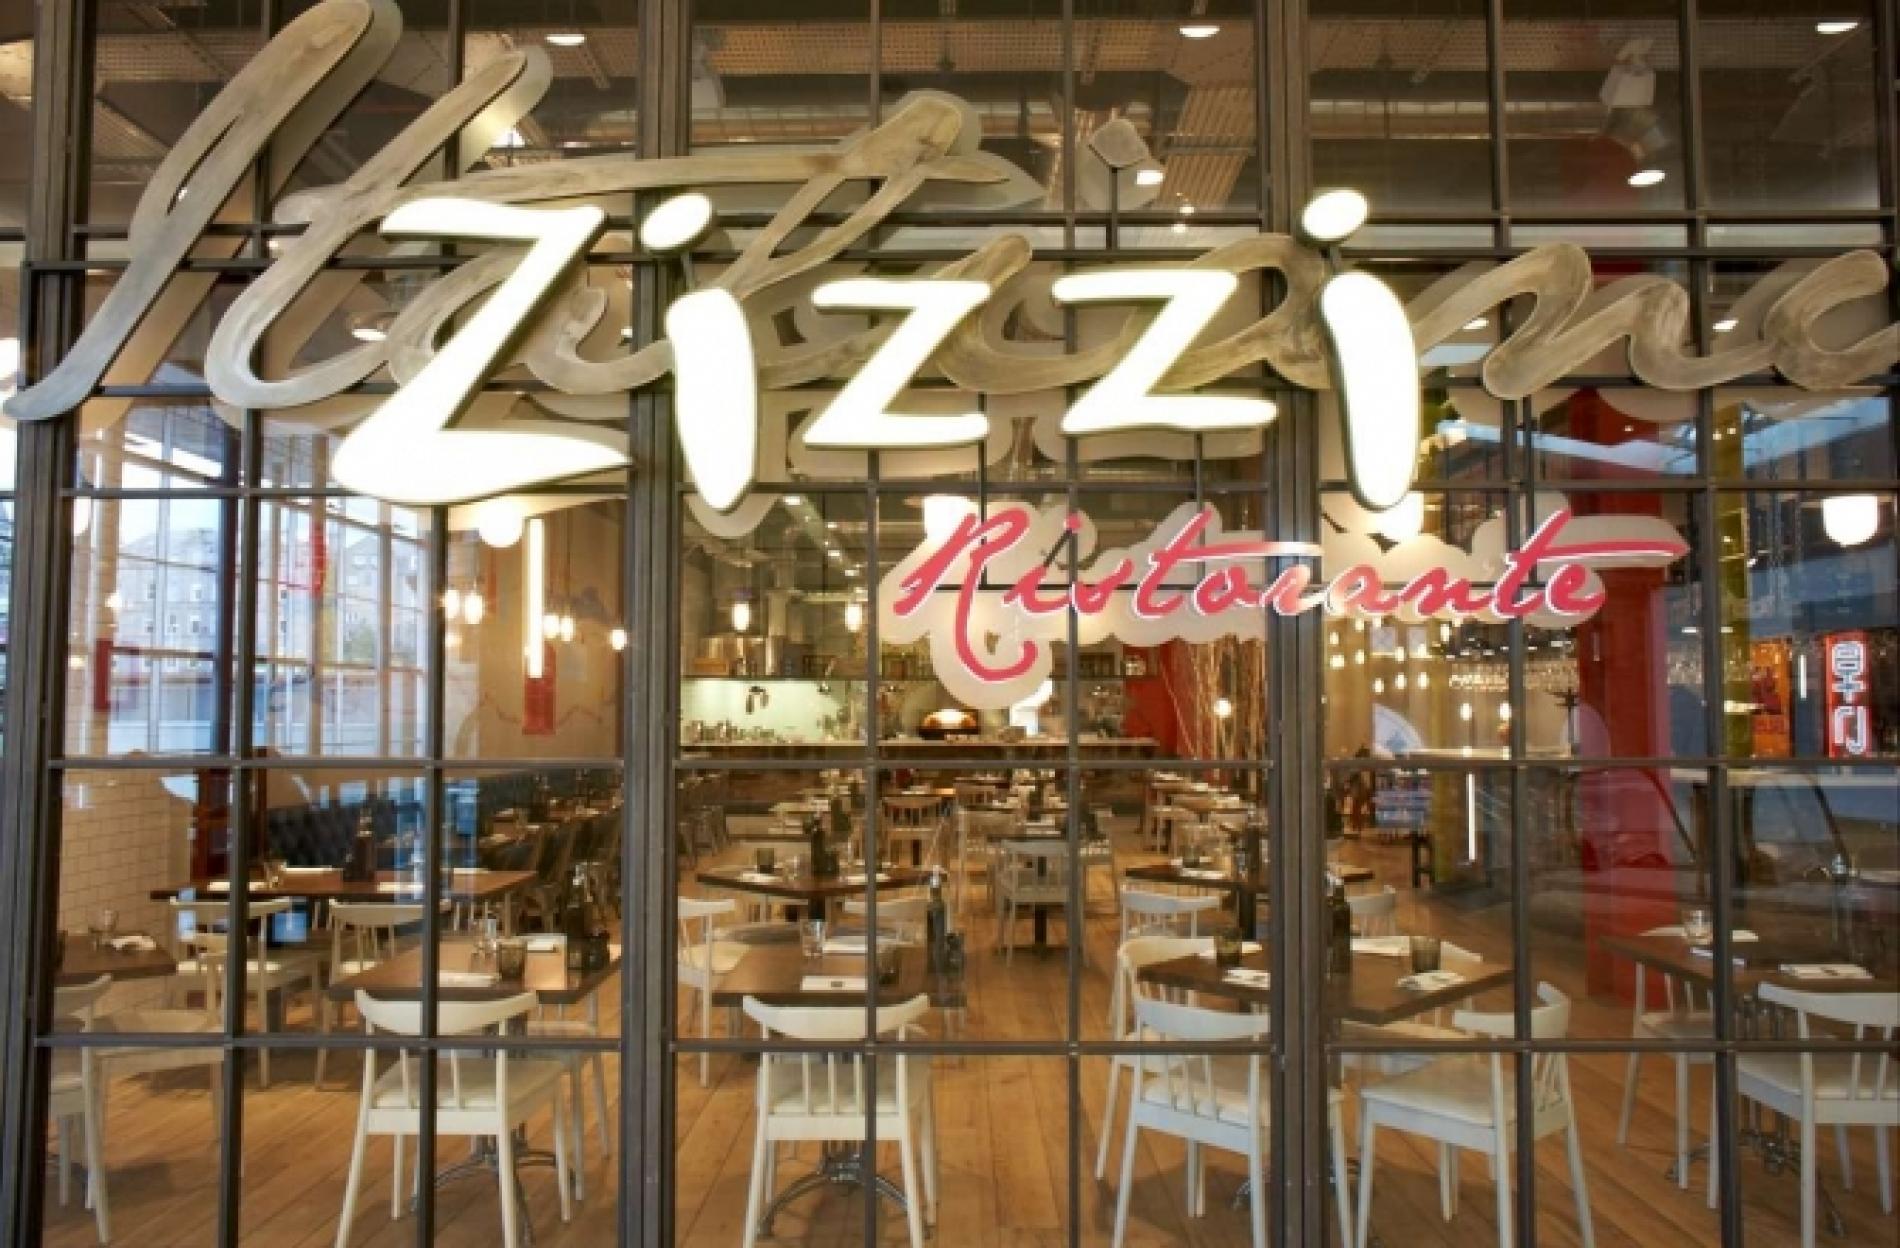 Enjoy Tasty Italian Dishes At Zizzi In Aberdeen City Centre